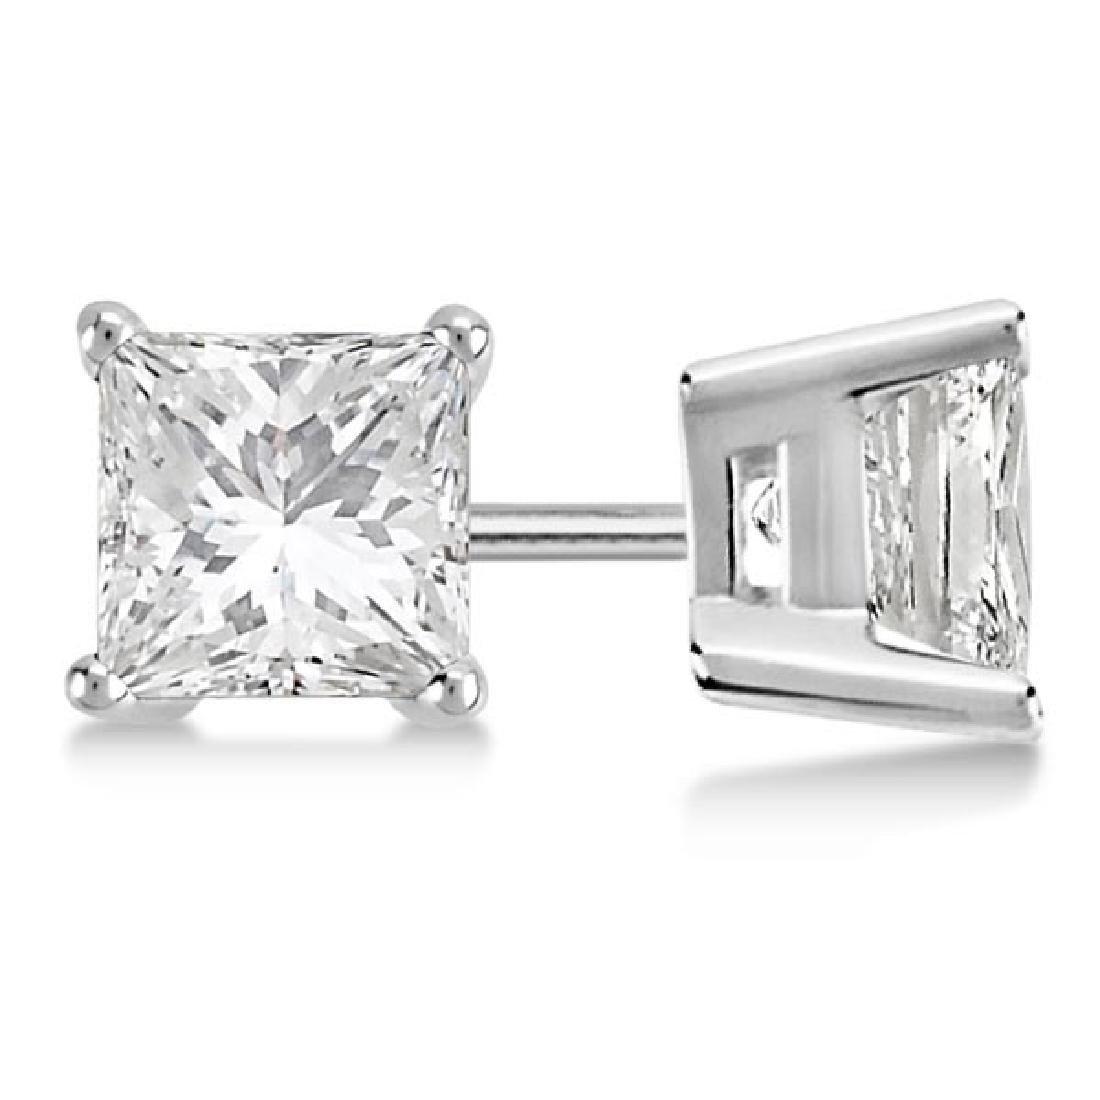 Certified 1 CTW Princess Diamond Stud Earrings D/SI2